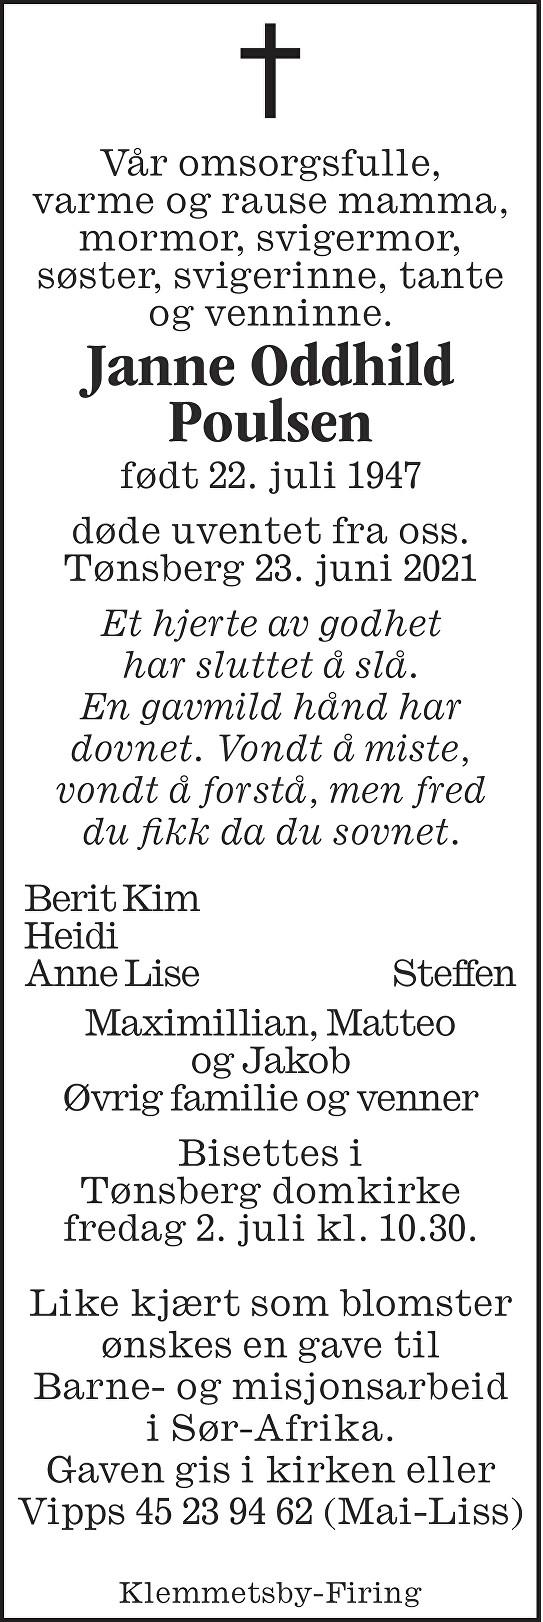 Janne Oddhild Poulsen Dødsannonse